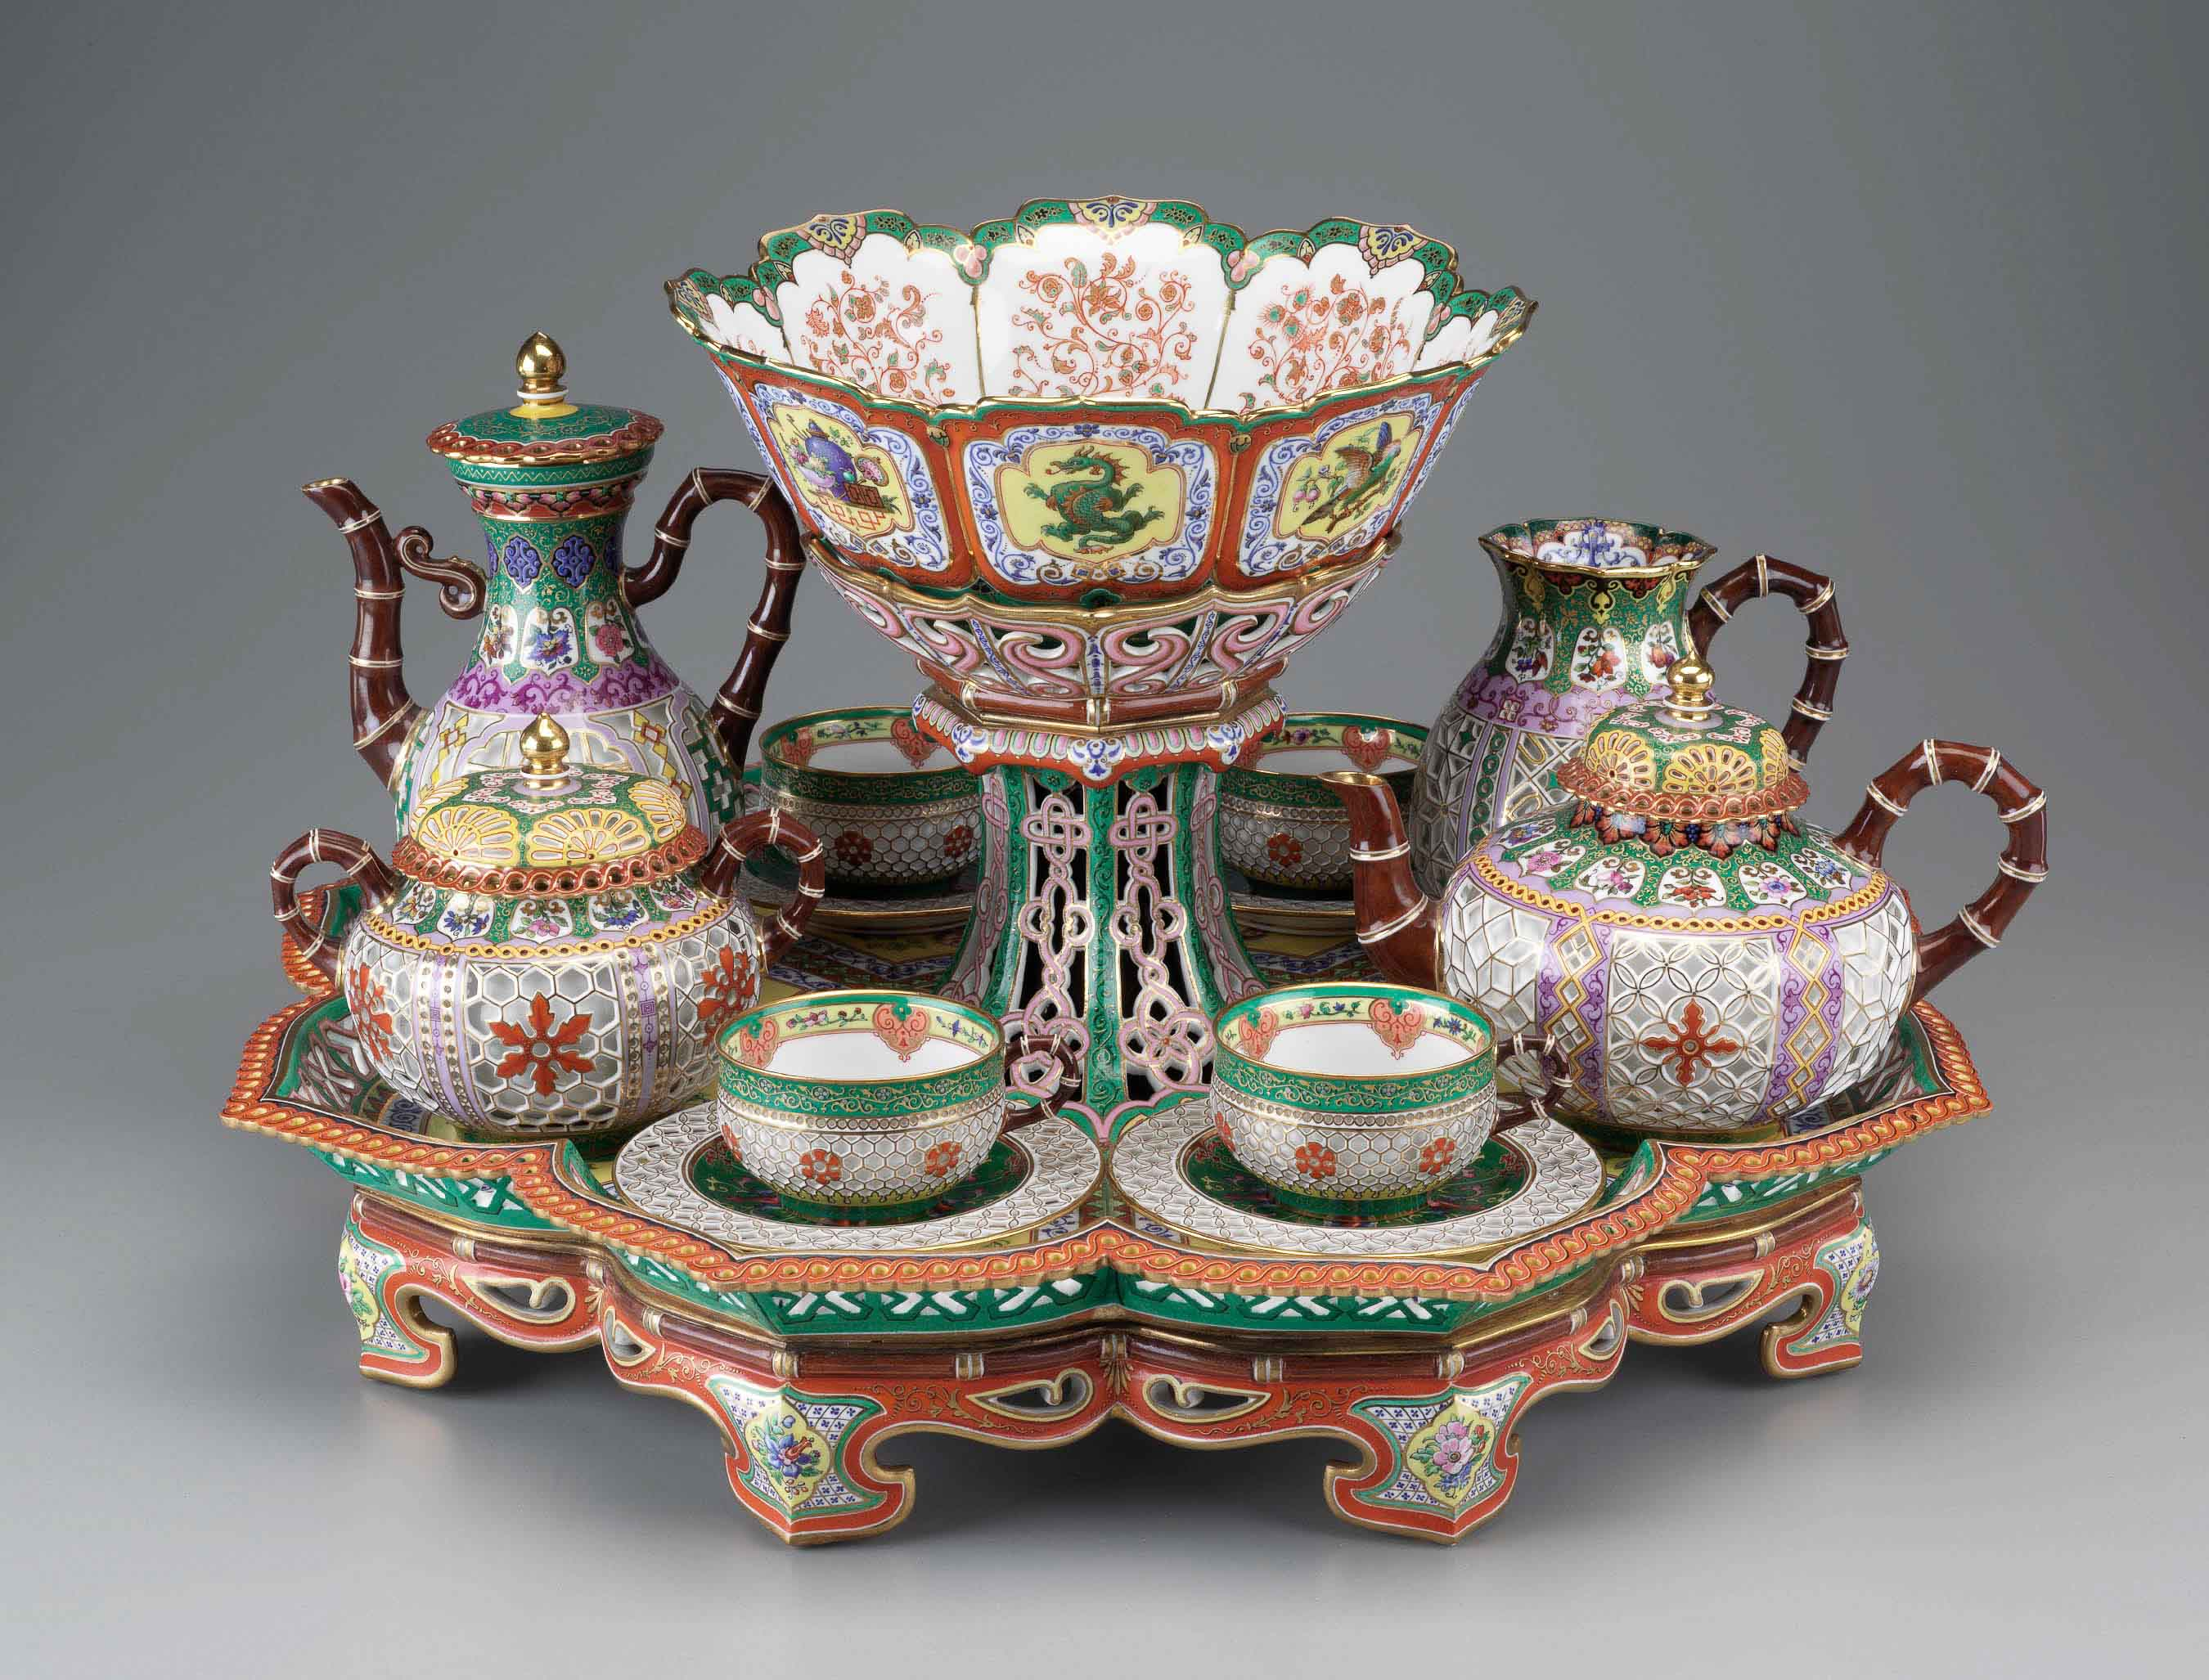 Pictured: Tea and Coffee Service, 1842–1843, Sèvres Porcelain Manufactory, designed by Hyacinthe Régnier, painted by Pierre Huard, hard paste porcelain, porcelain enamel, gold.